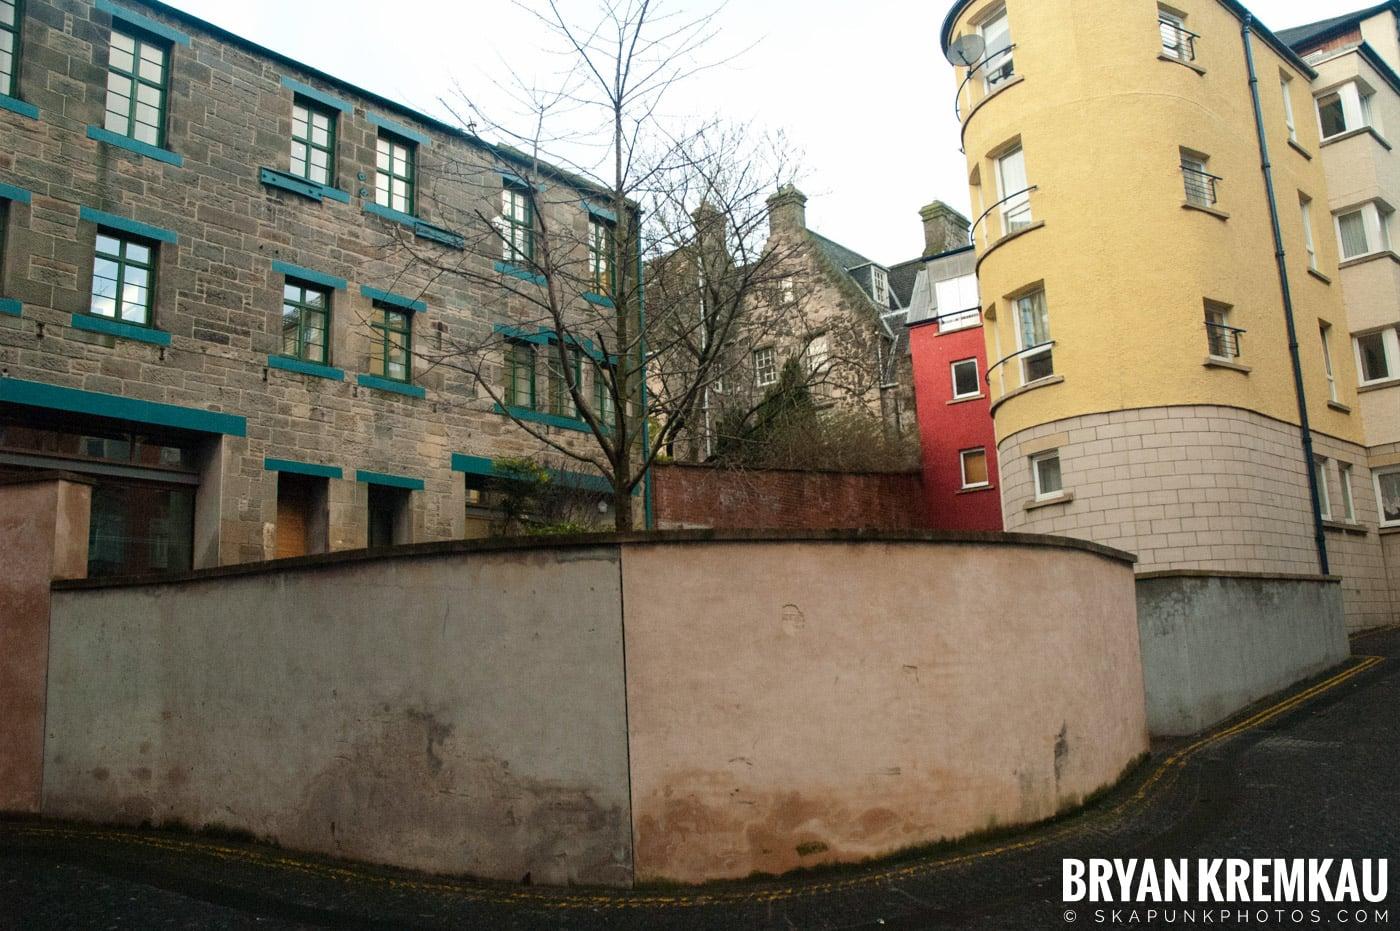 Edinburgh, Scotland - Day 1 - 12.12.06 (29)